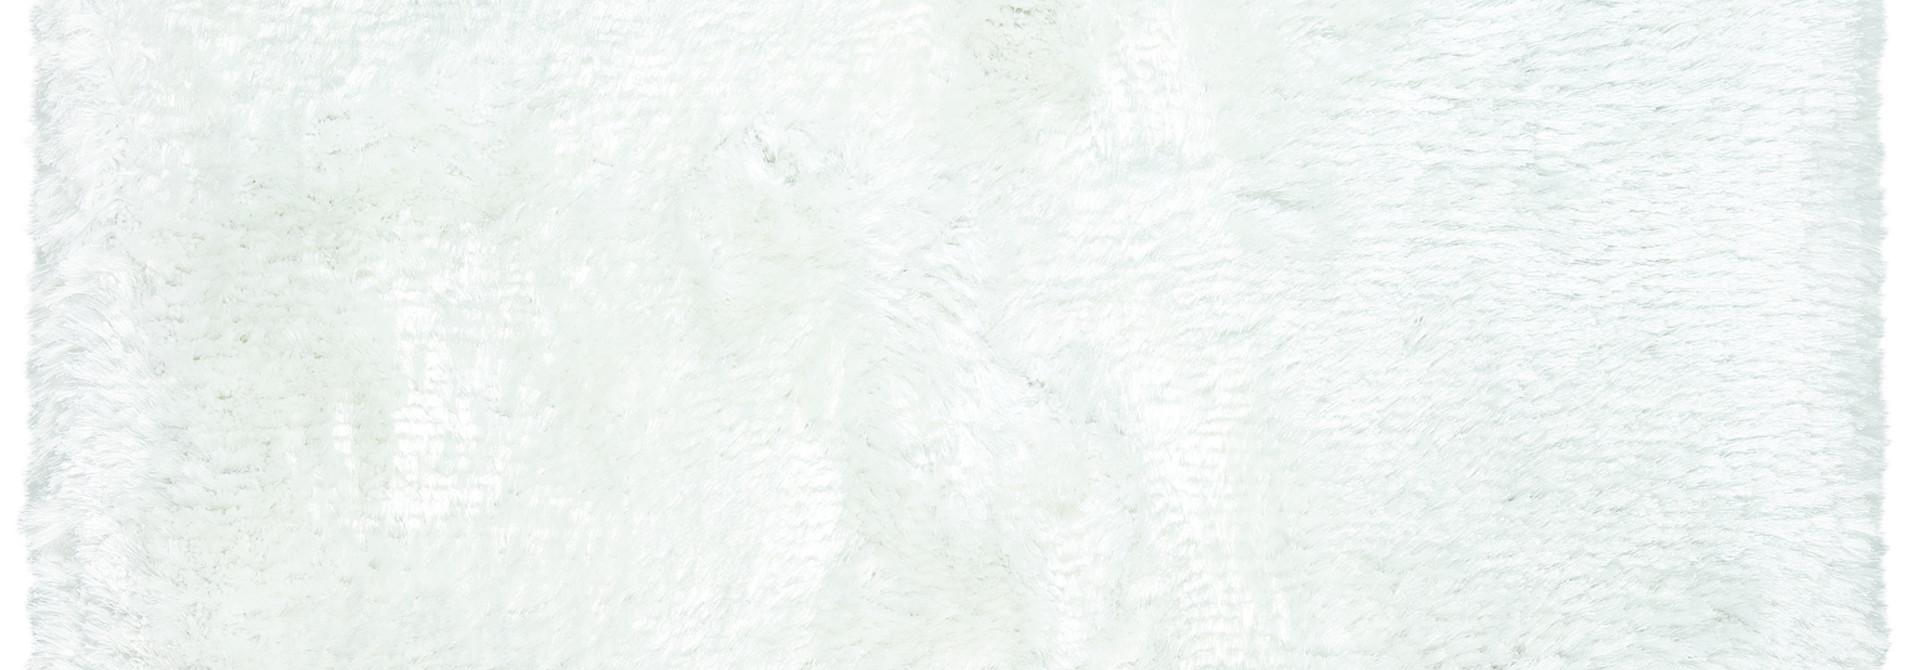 Vloerkleed Adore 100 170x240cm